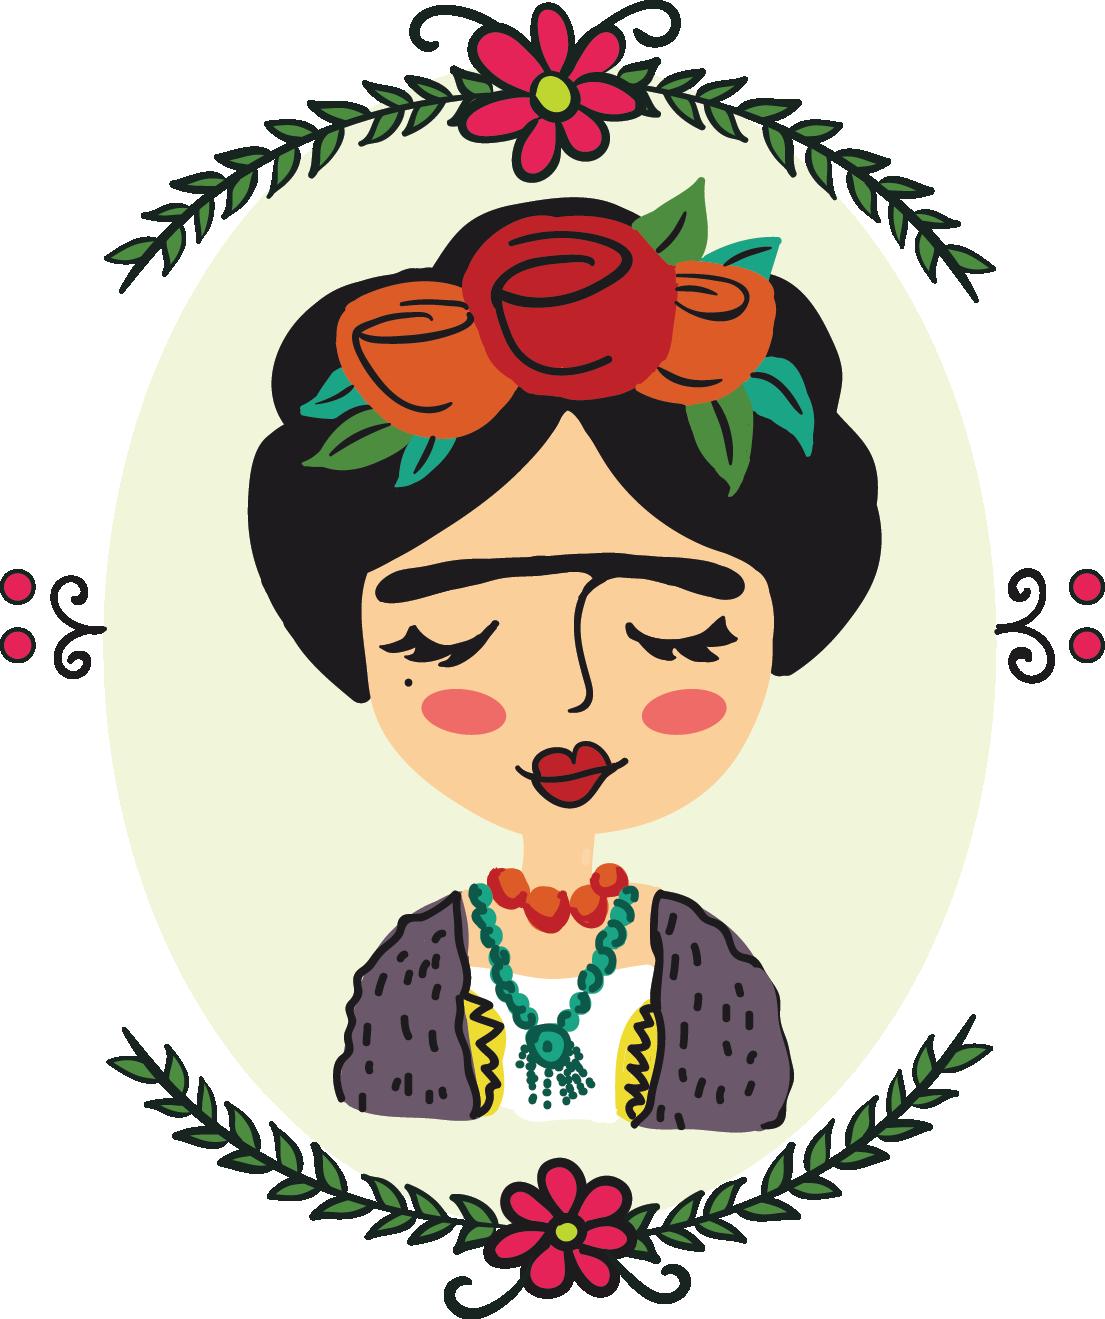 Frida kahlo clipart free clip royalty free Frida kahlo clipart clipart images gallery for free download ... clip royalty free